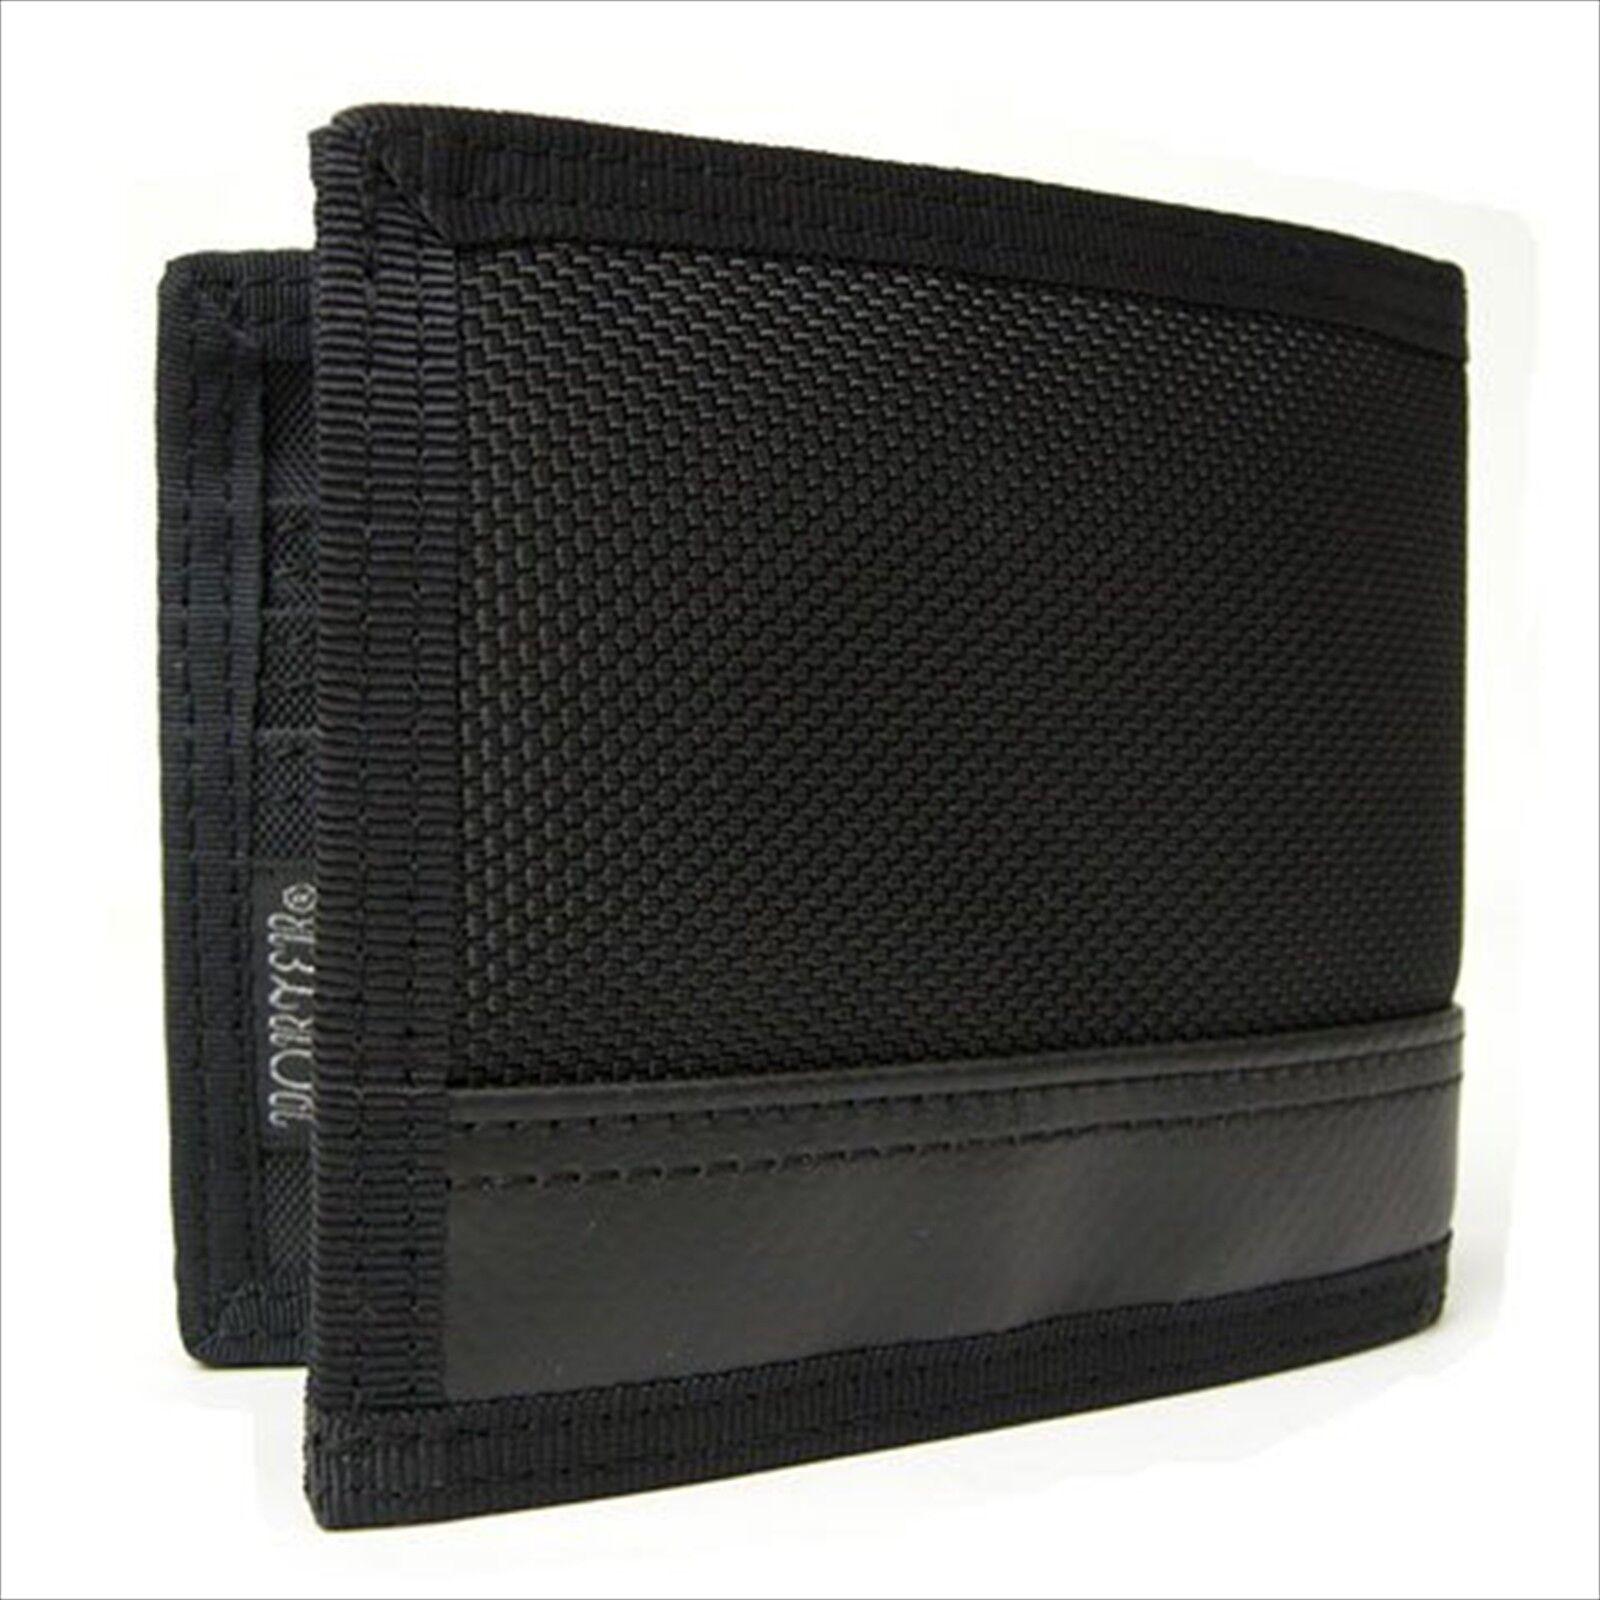 Black YOSHIDA Porter PORTER fold wallet HEAT 703-07976 FROM JAPAN NEW.